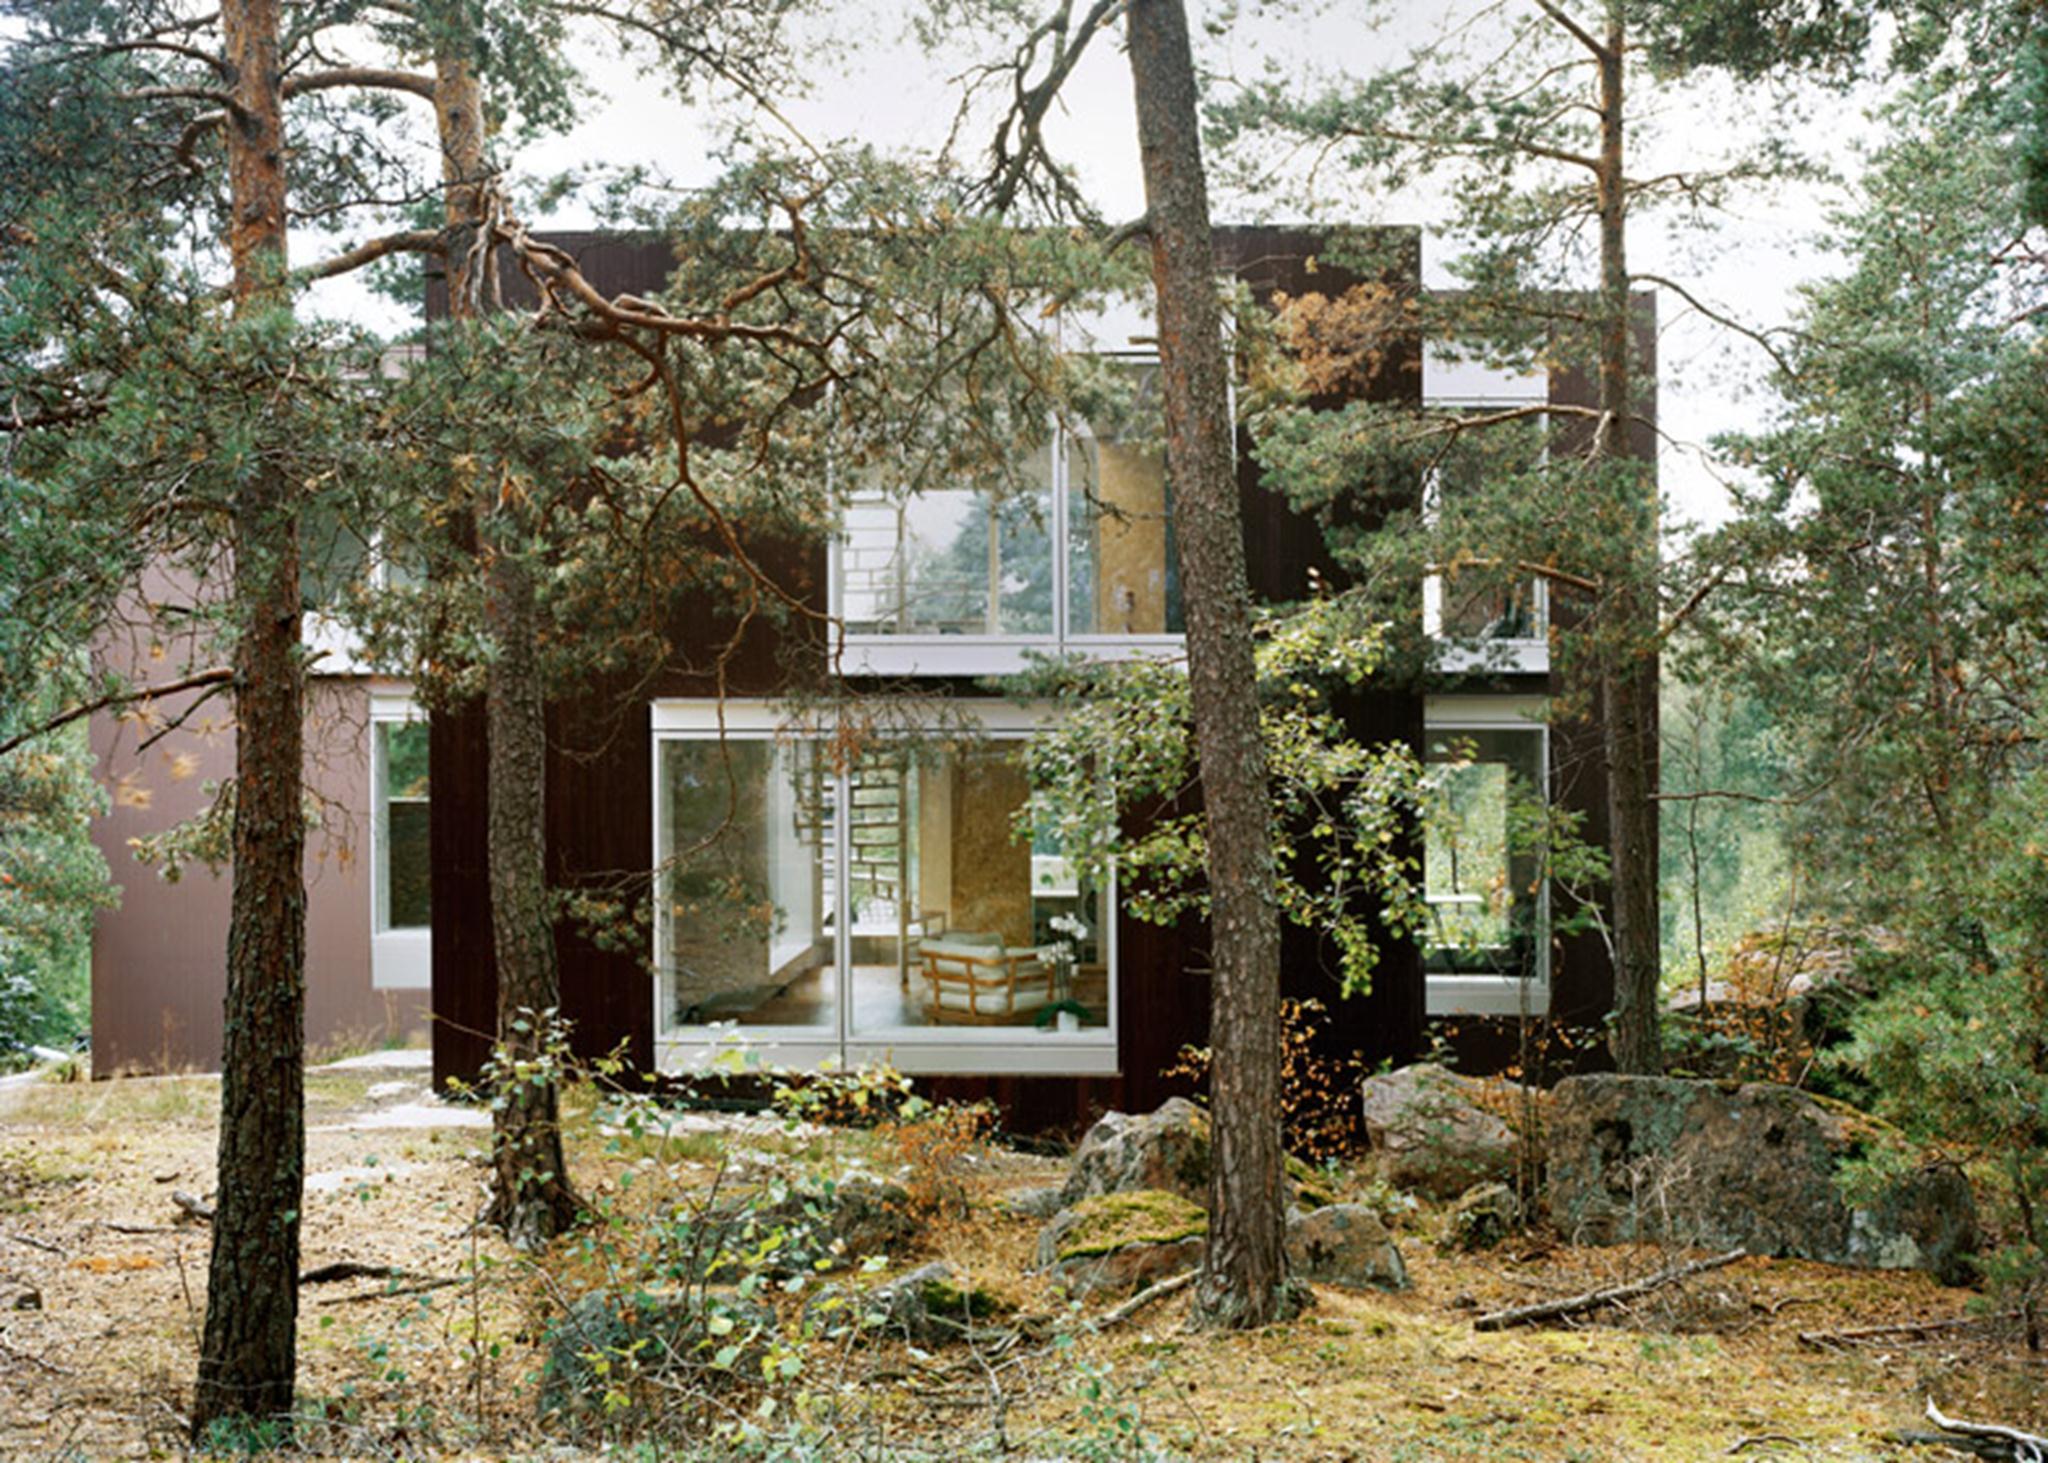 Villa-Altona-by-The-Common-Office_dezeen_784_4 (Copy)